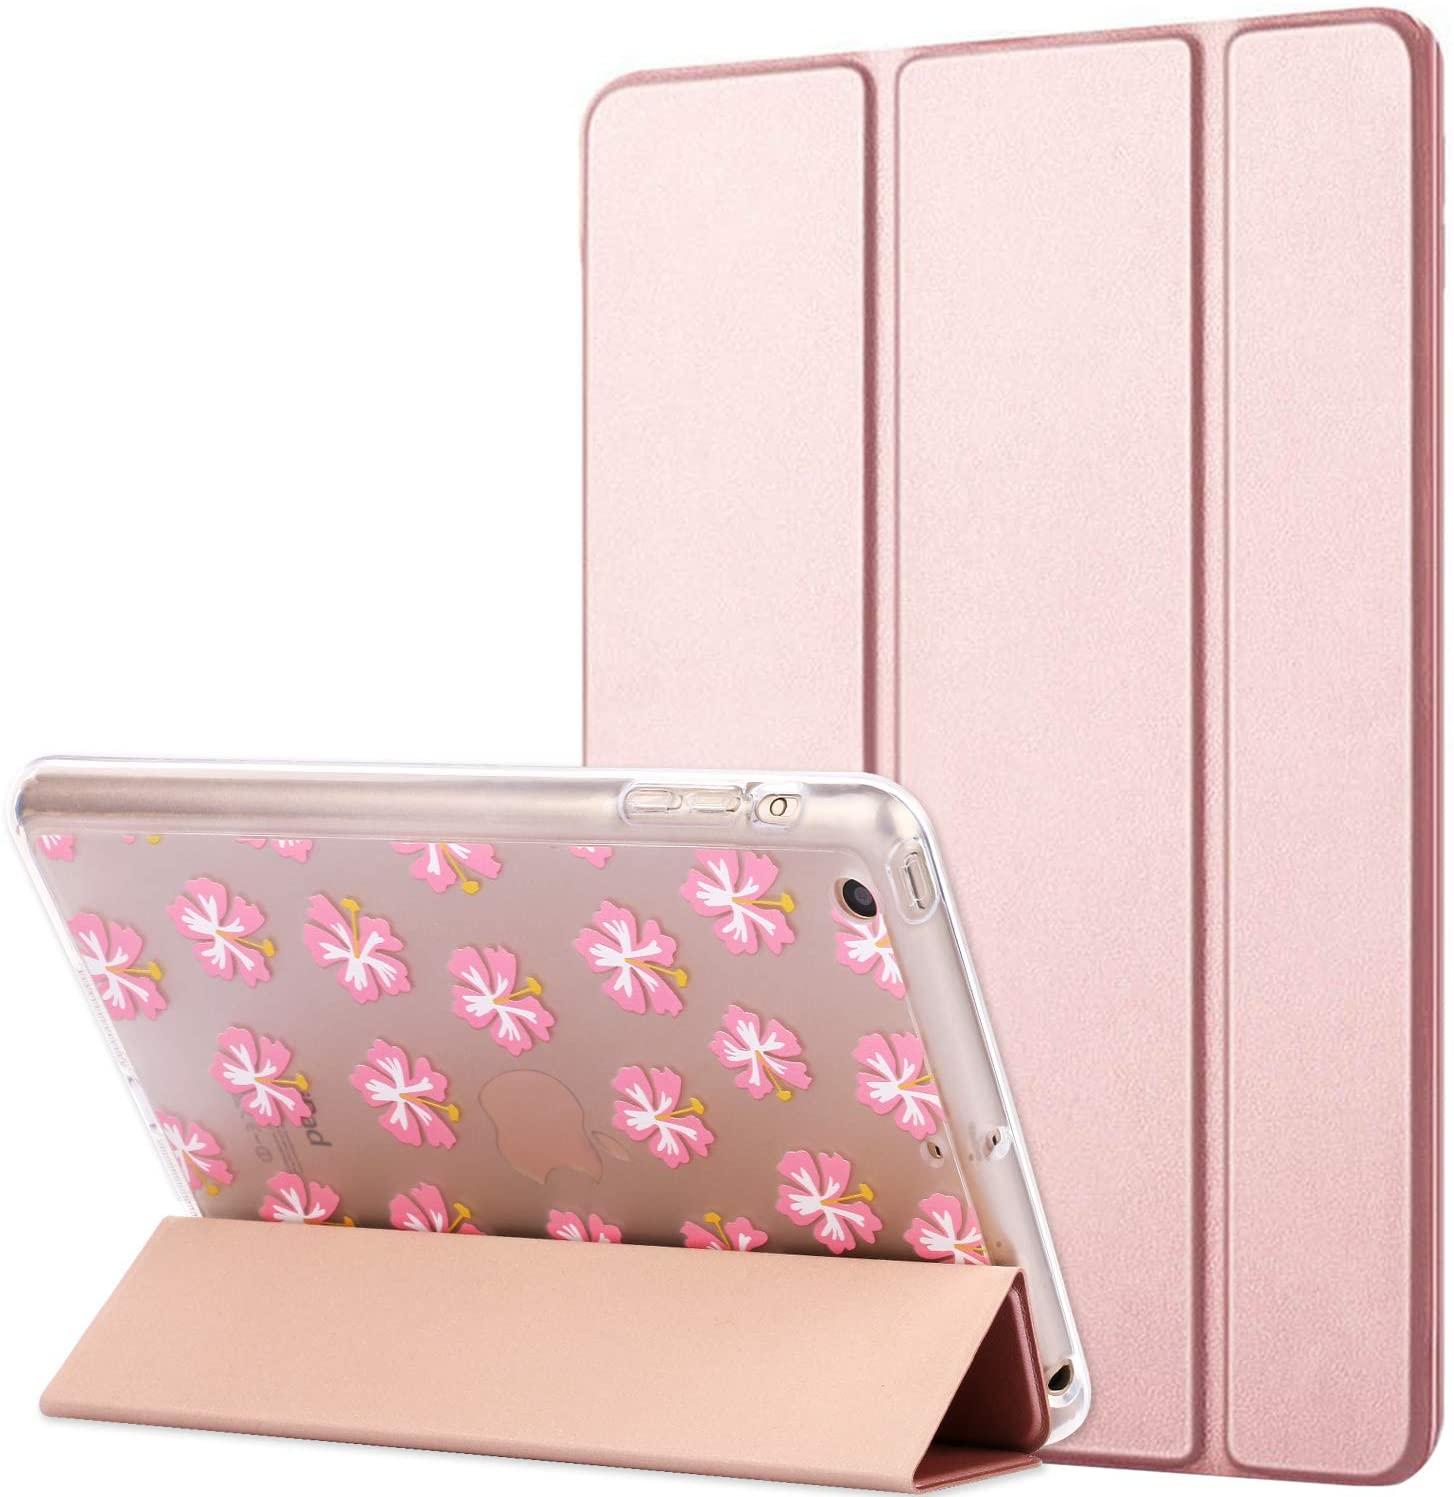 Dailylux iPad Mini Case,iPad Mini 2 Case,Smart Folio Stand Cover Ultra Slim Light Weight Shockproof TPU + Hard PC Cover Flower Pattern w/Auto Sleep/Wake Function for ipad Mini 1/2/3-Rose Gold